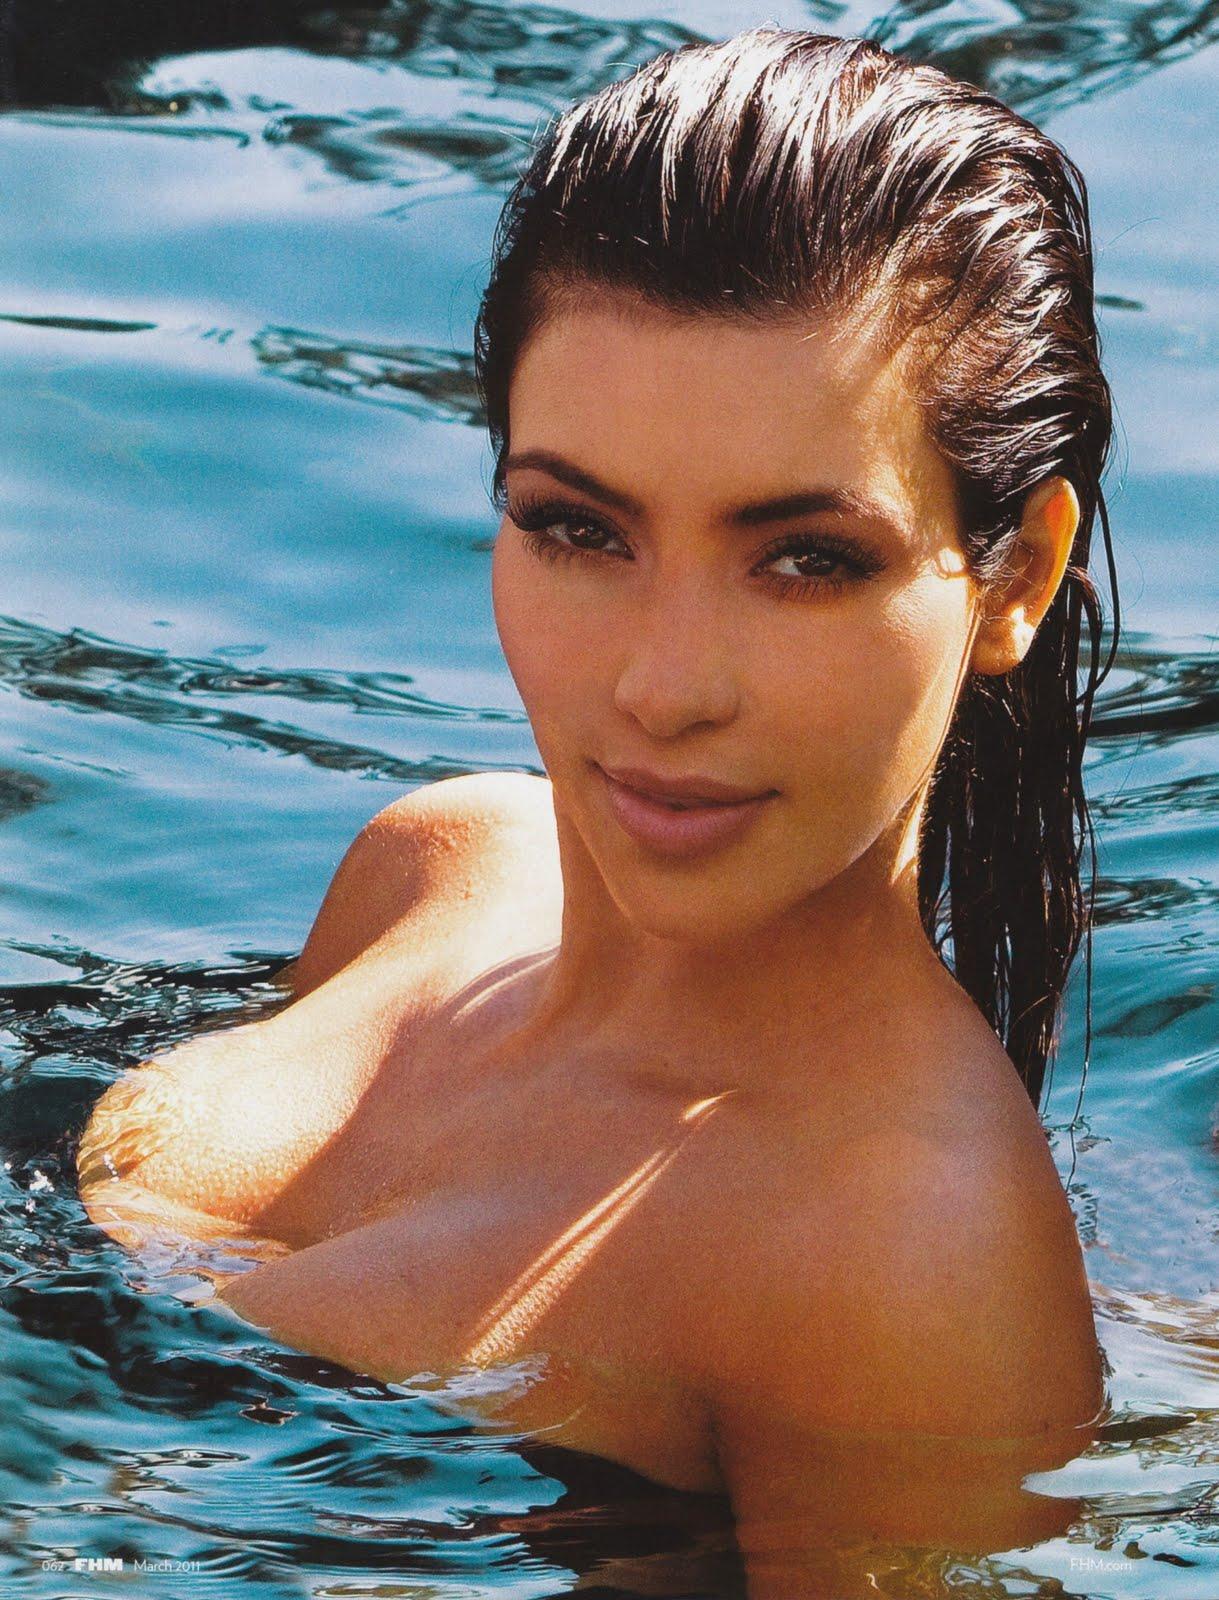 http://2.bp.blogspot.com/_ImioM_zH-NY/TVF7Eu4wf8I/AAAAAAAABuI/0xnRHmNzHK0/s1600/Kim-Kardashian-4.jpg